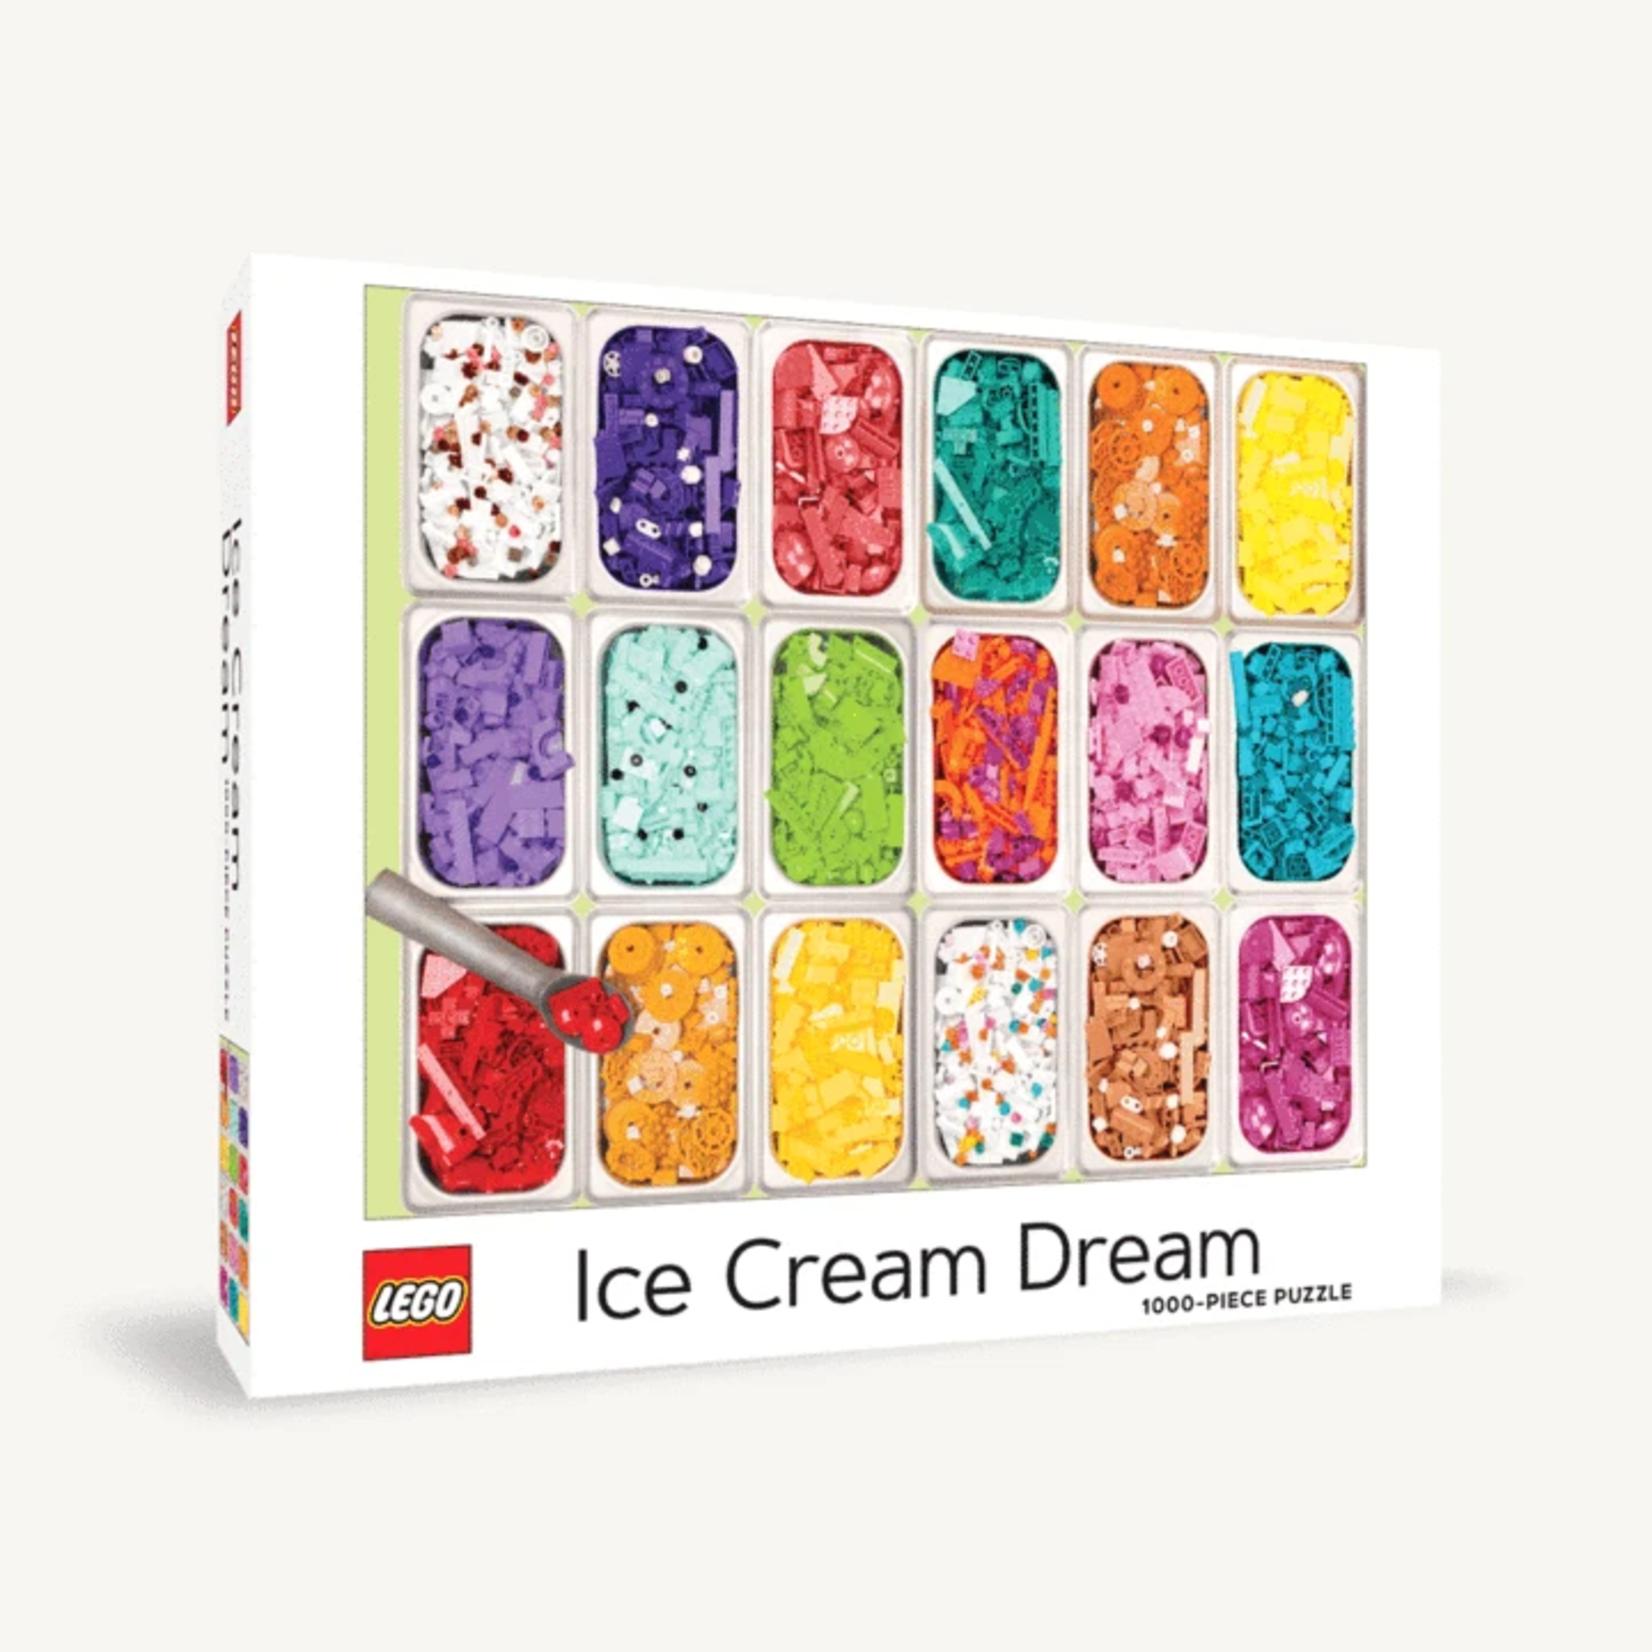 Chronicle Books Lego Ice Cream Dream - 1000 Piece Jigsaw Puzzle